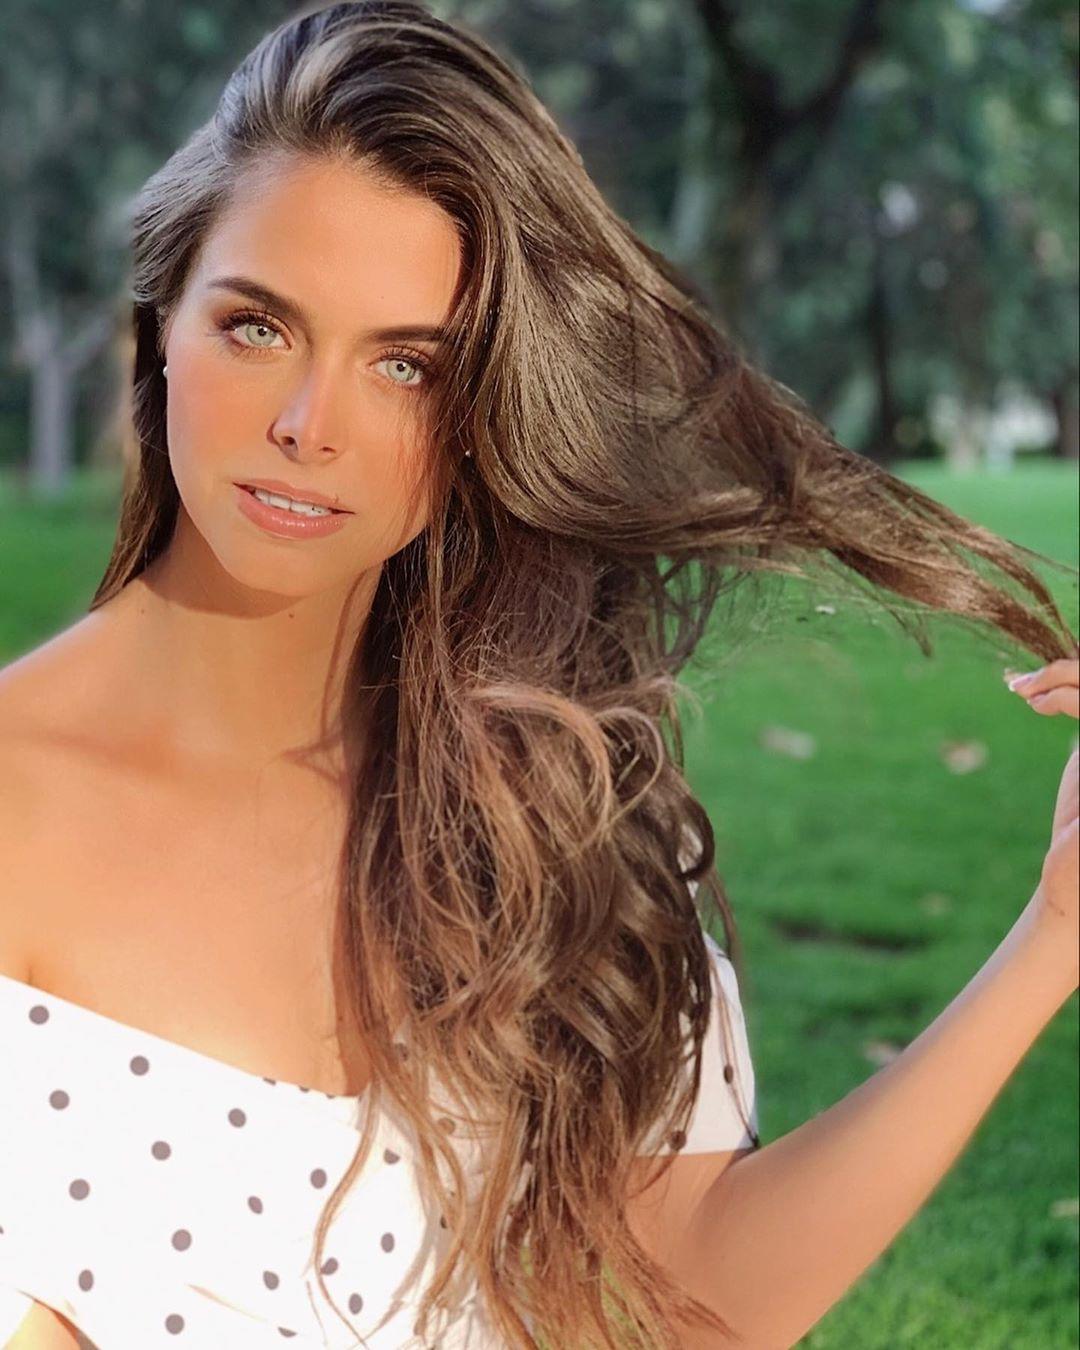 regina peredo, reyna hispanoamericana 2019. - Página 2 70118010